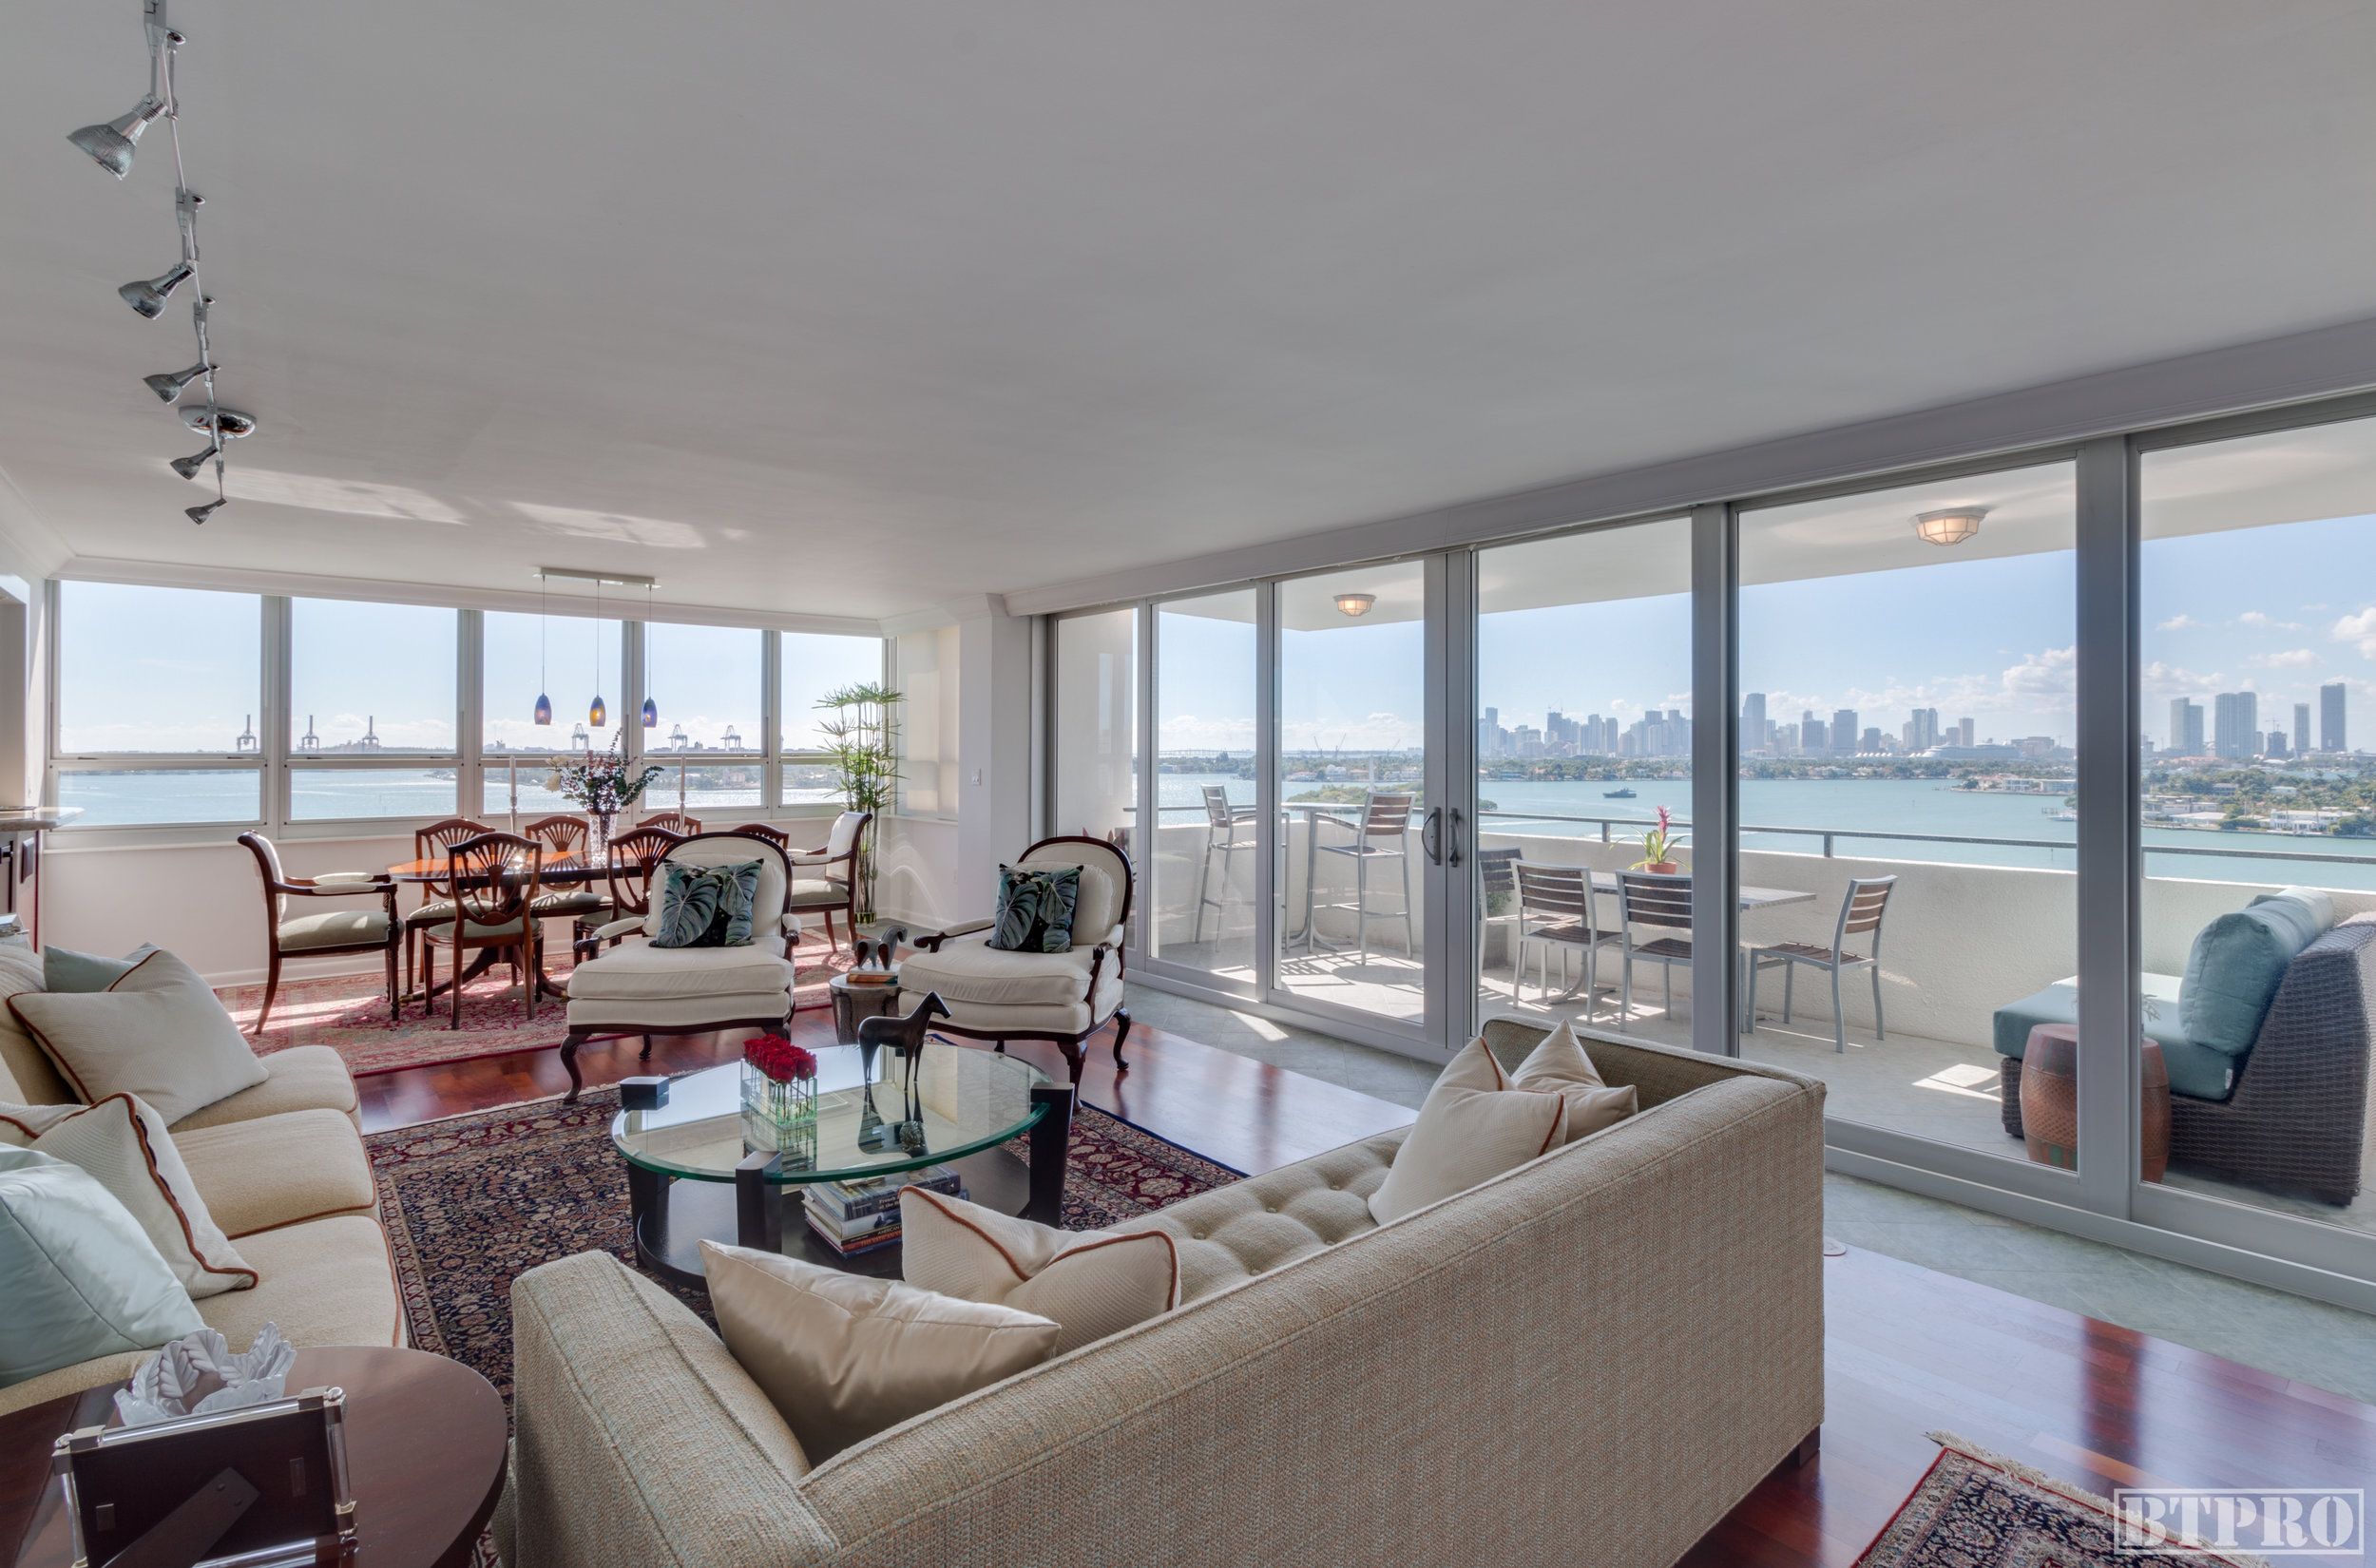 real estate, real estate photo, real estate photography, miami, miami real estate, miami beach real estate, south beach real estate